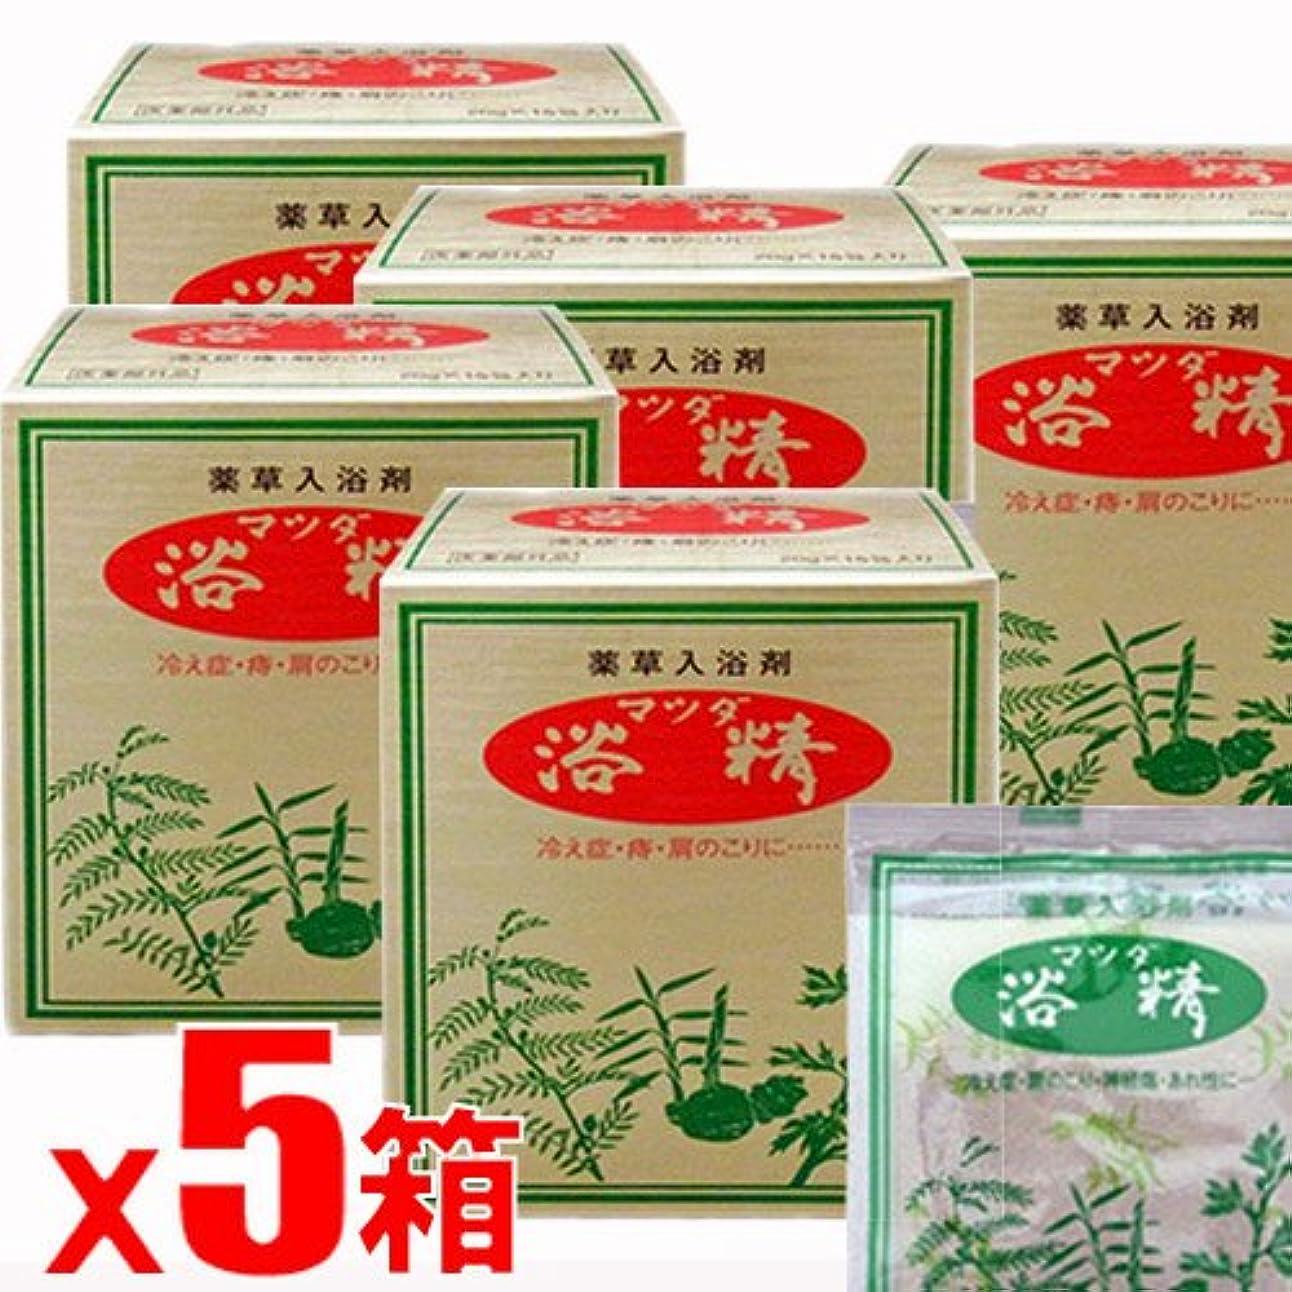 寝具メンバー外科医【5箱】薬草入浴剤 マツダ浴精 20g×15包x5箱(4962461435165-5)